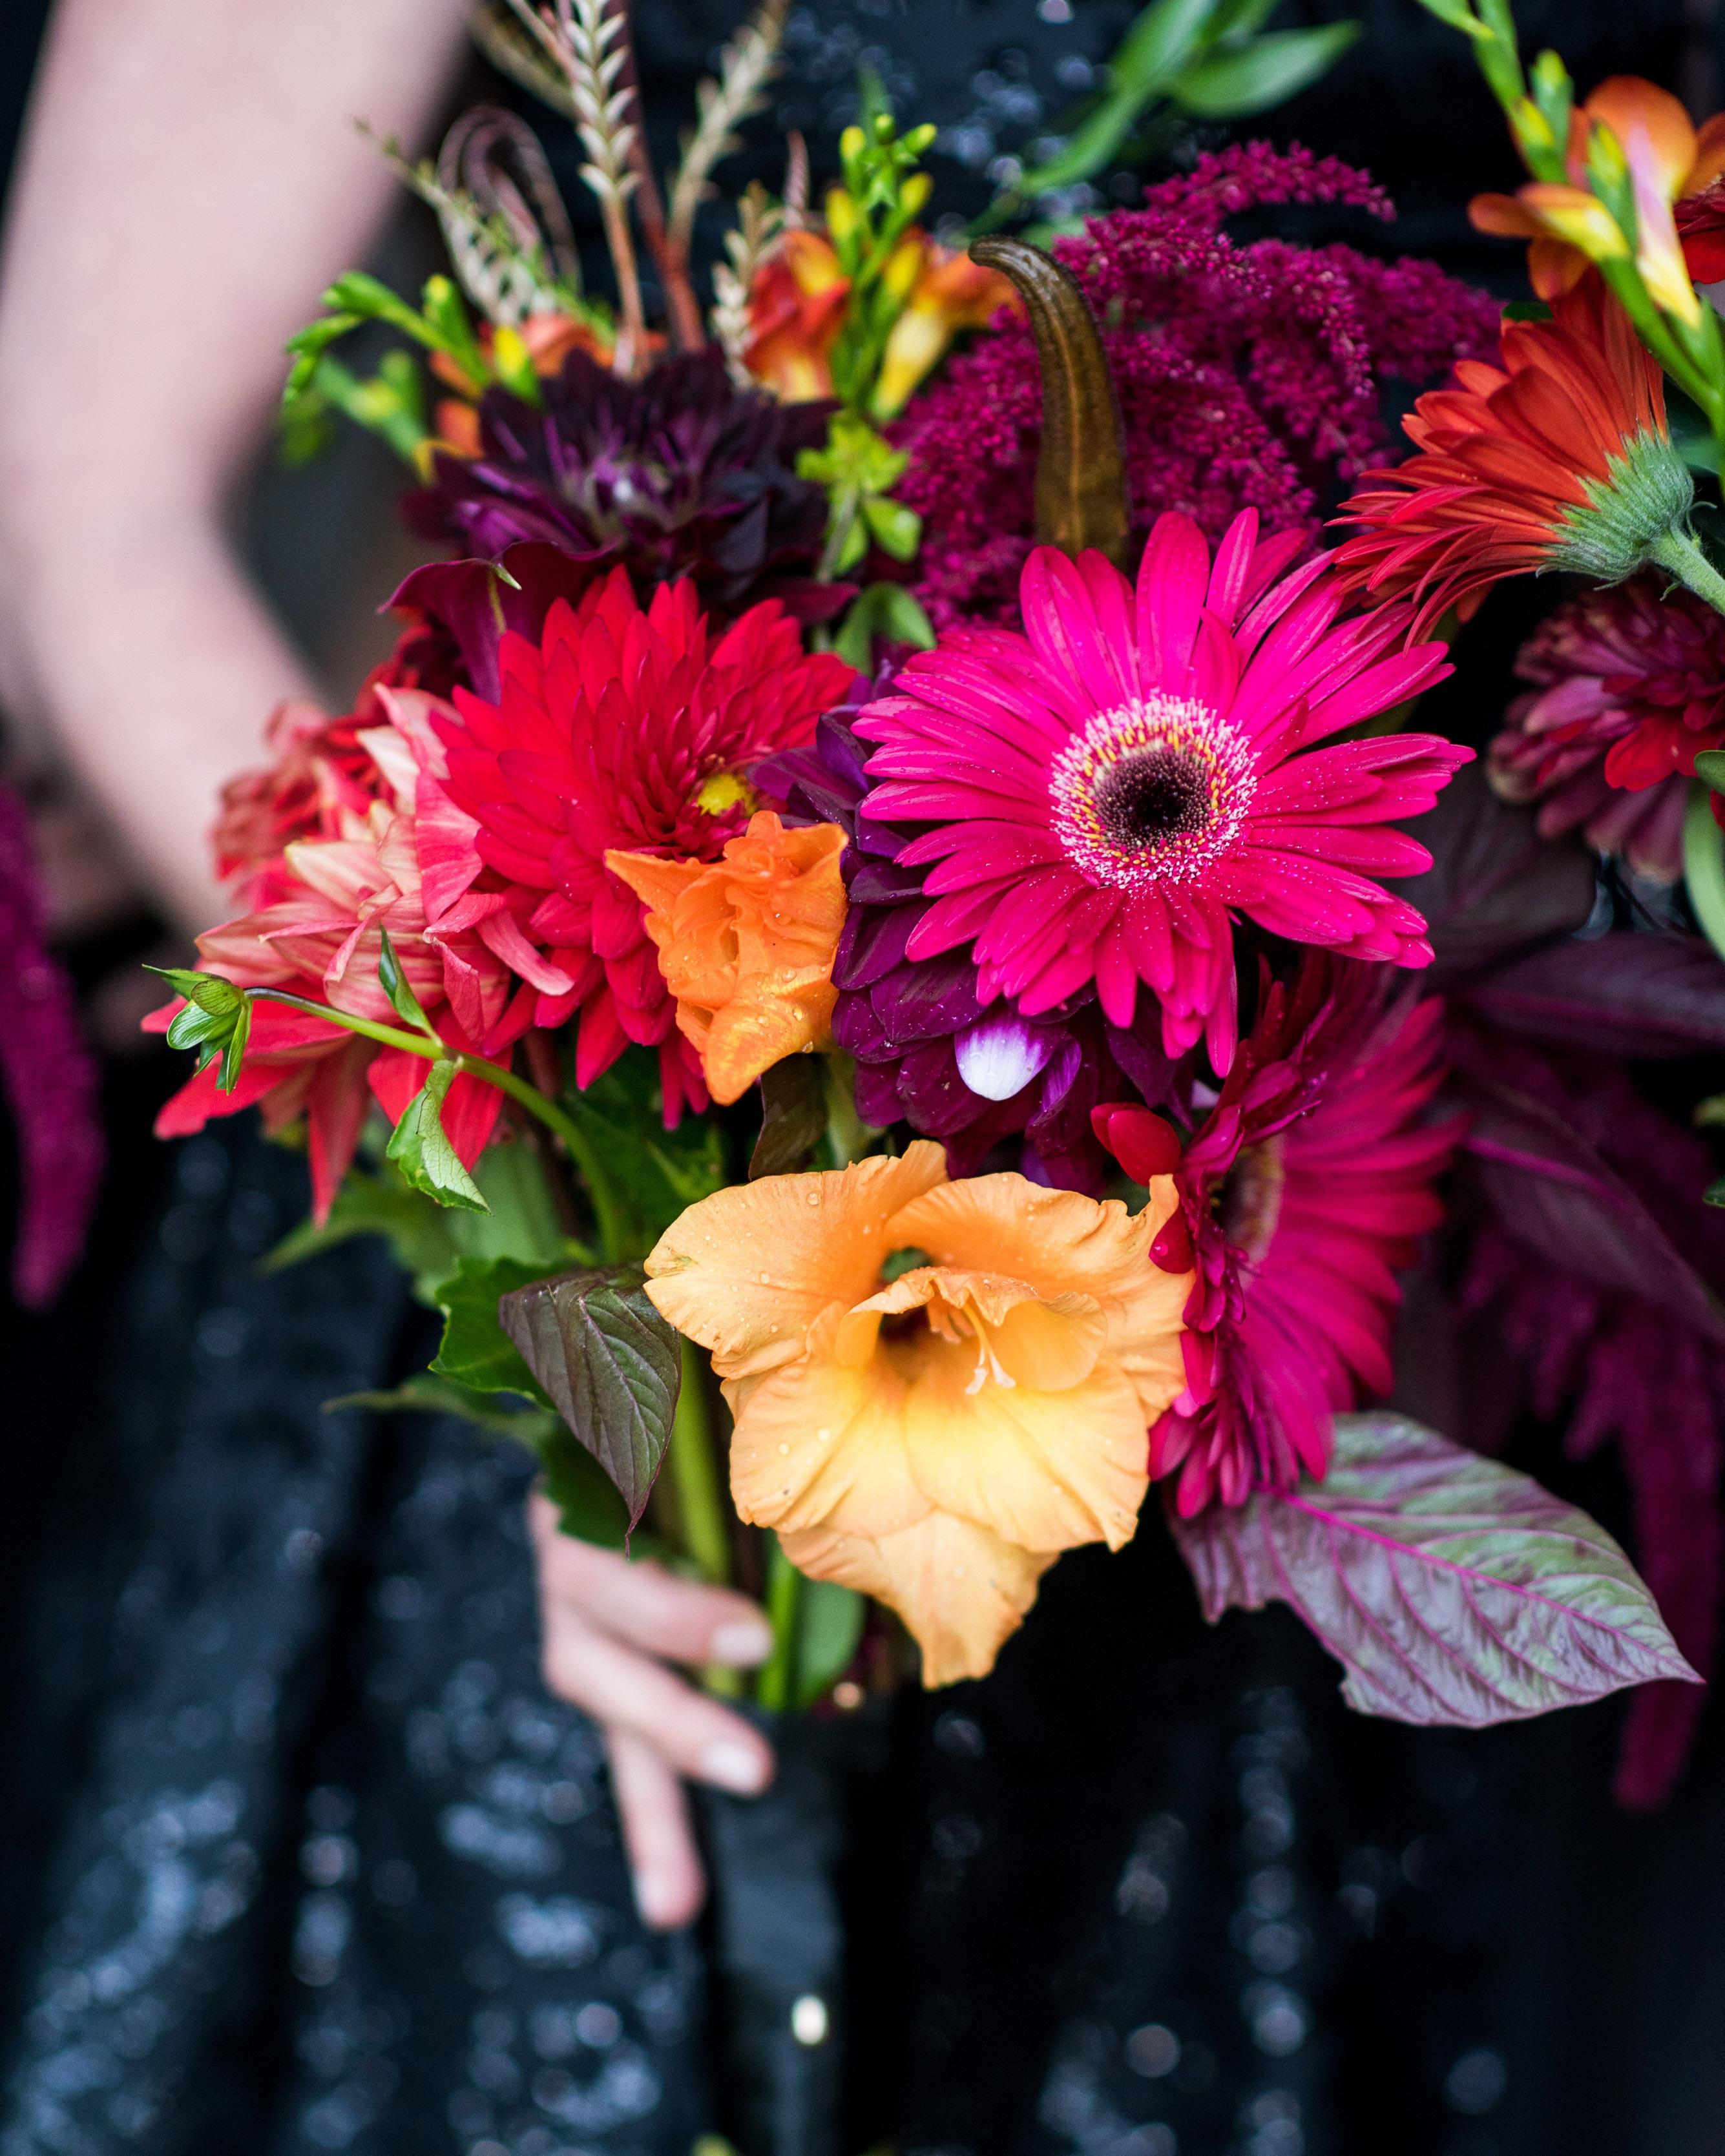 christopher-stephen-wedding-bouquet-0182-s112787-0416.jpg